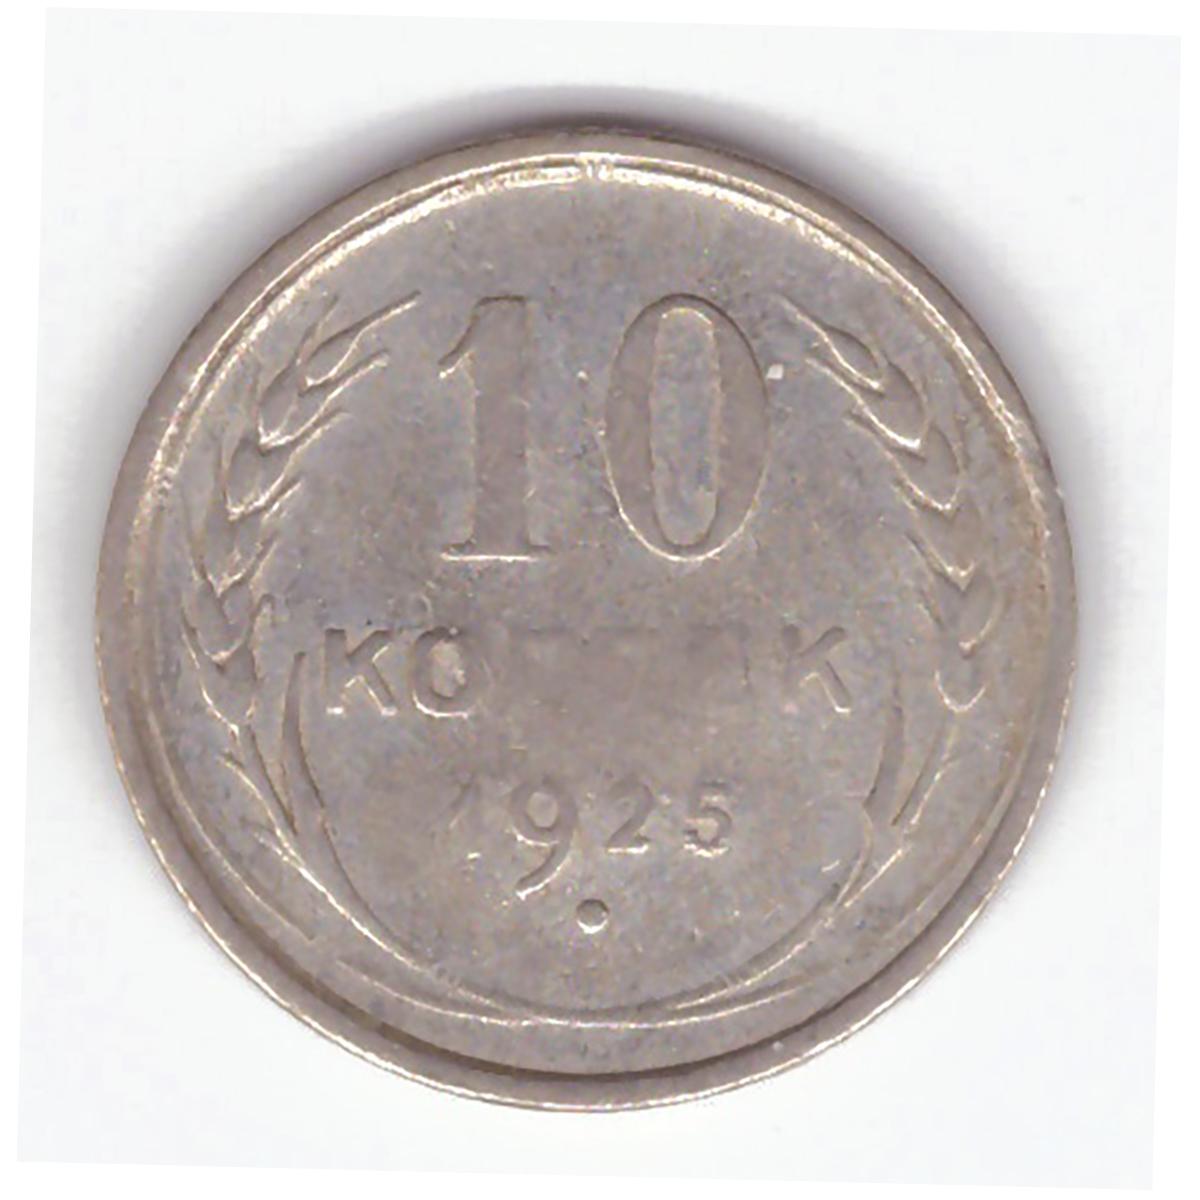 10 копеек 1925 года F №9